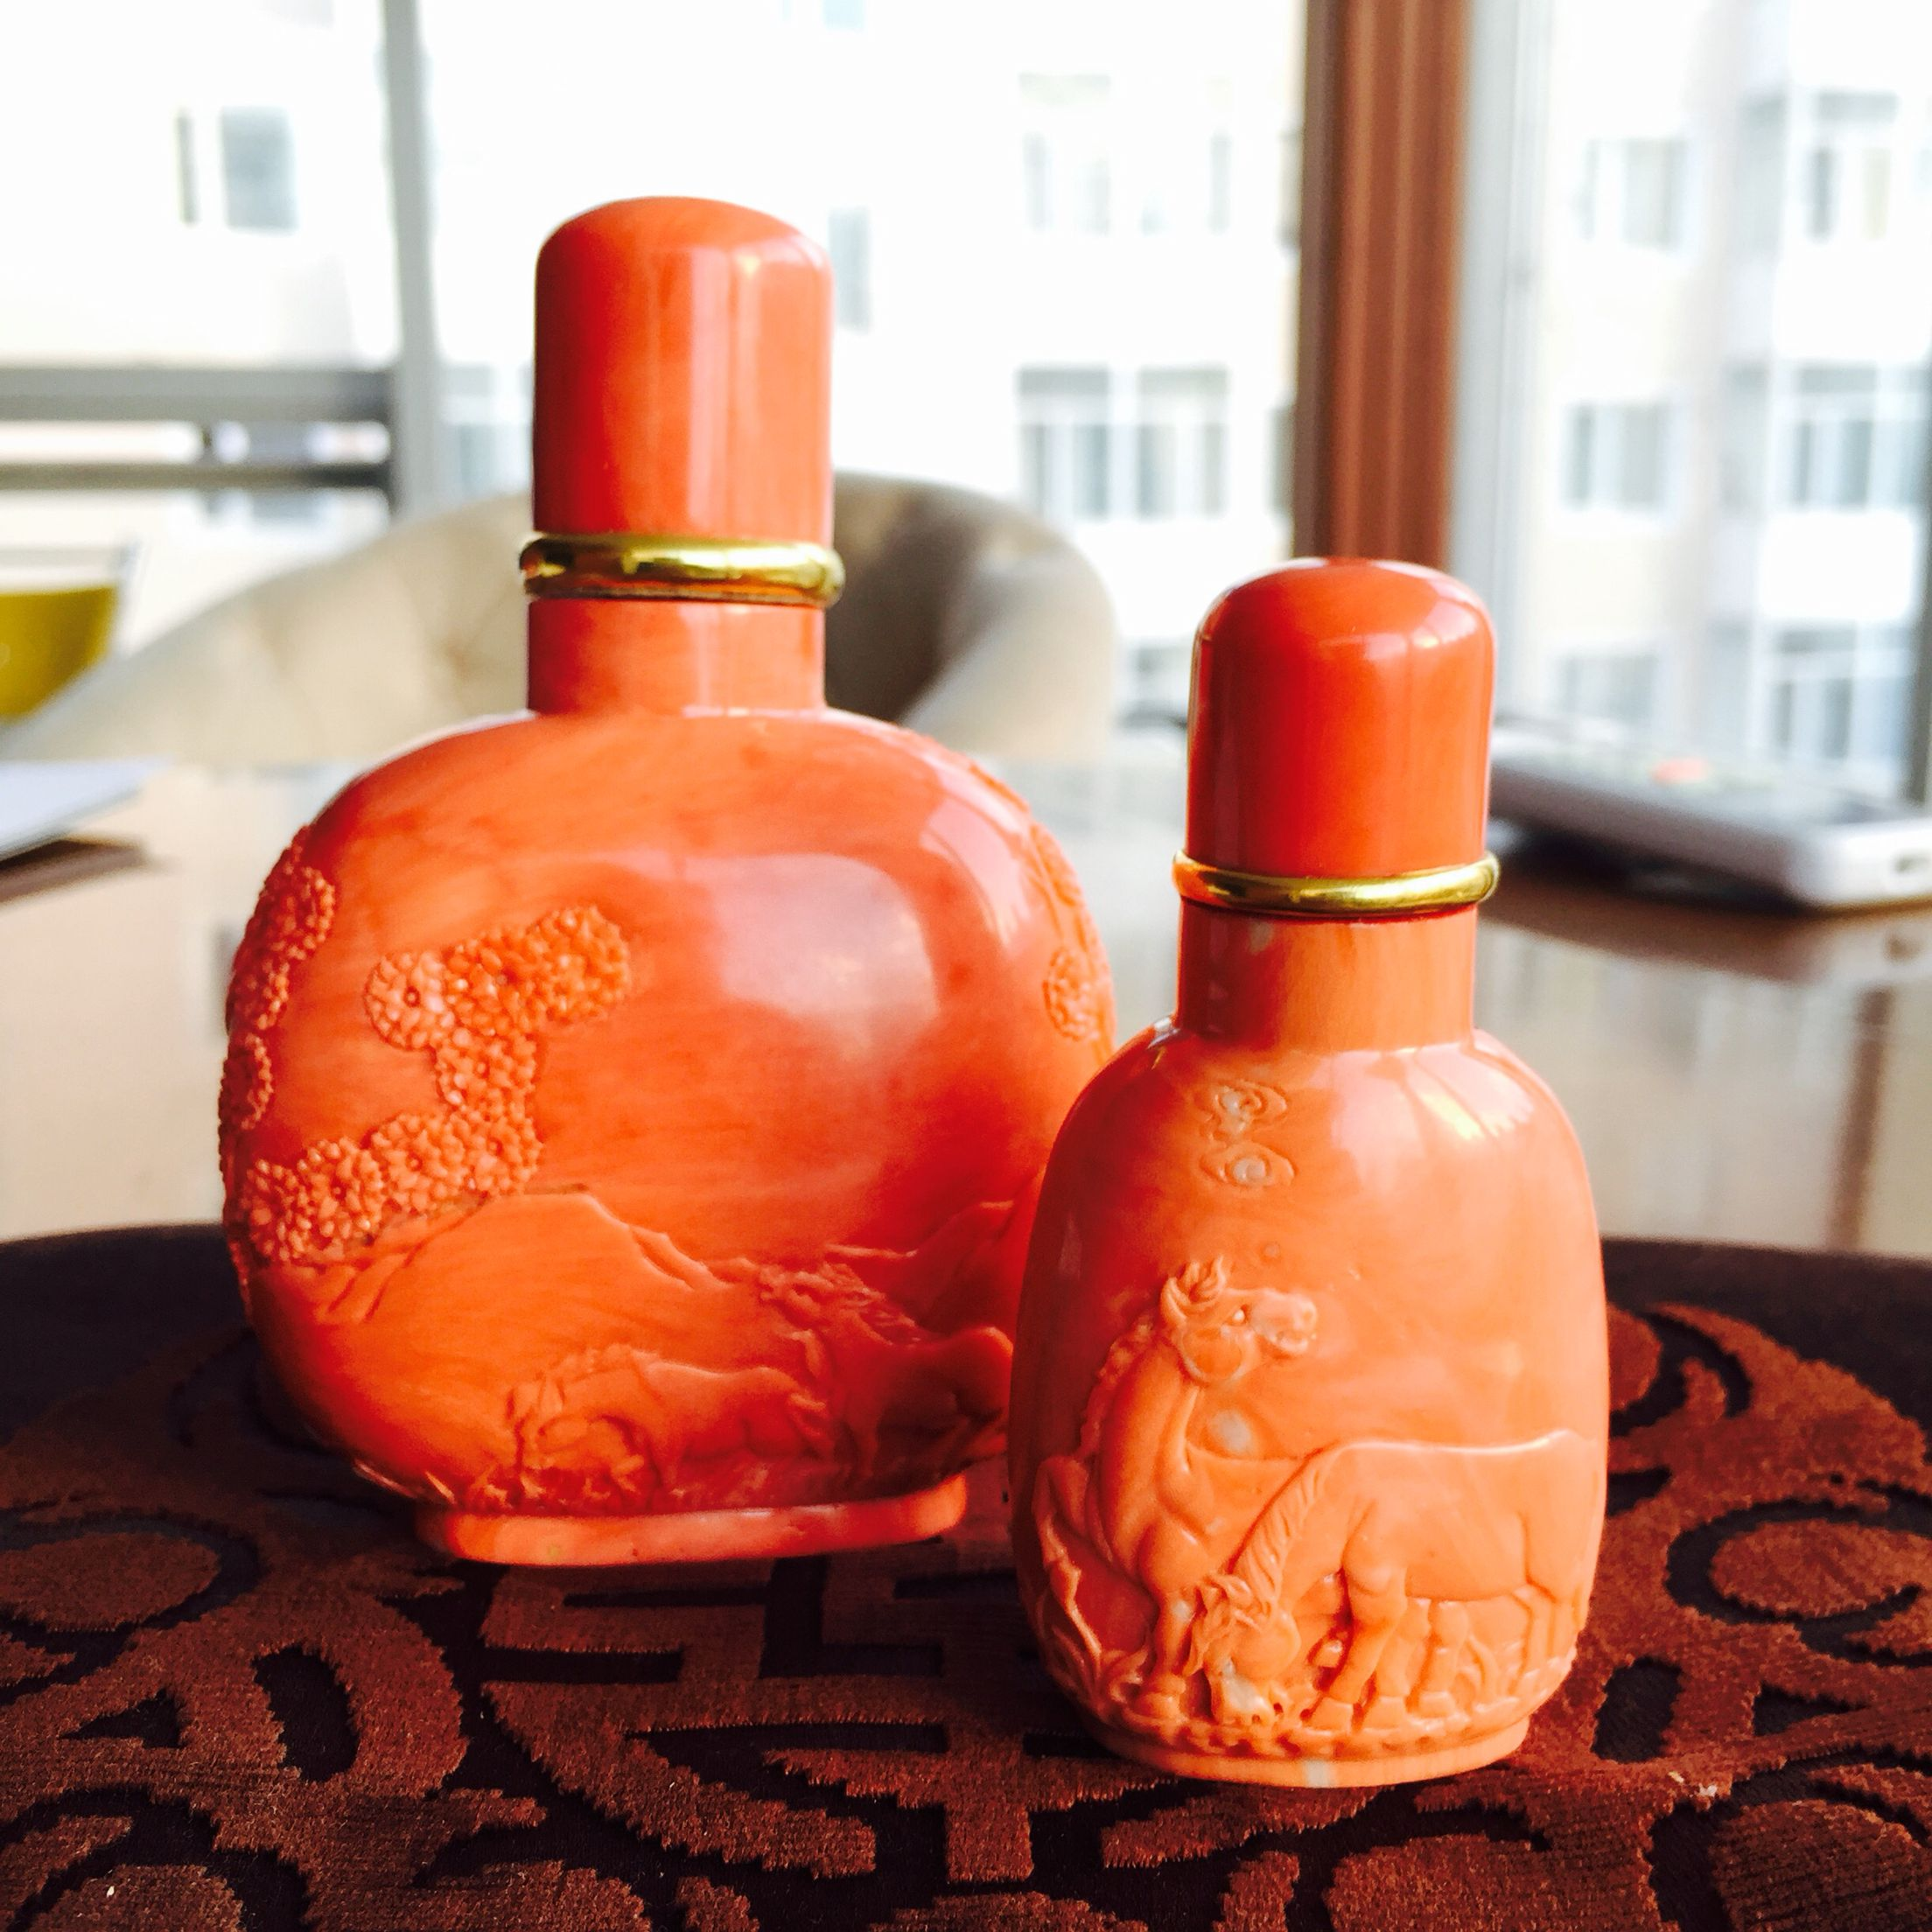 Coral Gemstone Snuff Bottle Coral Sculpture Wine Bottle